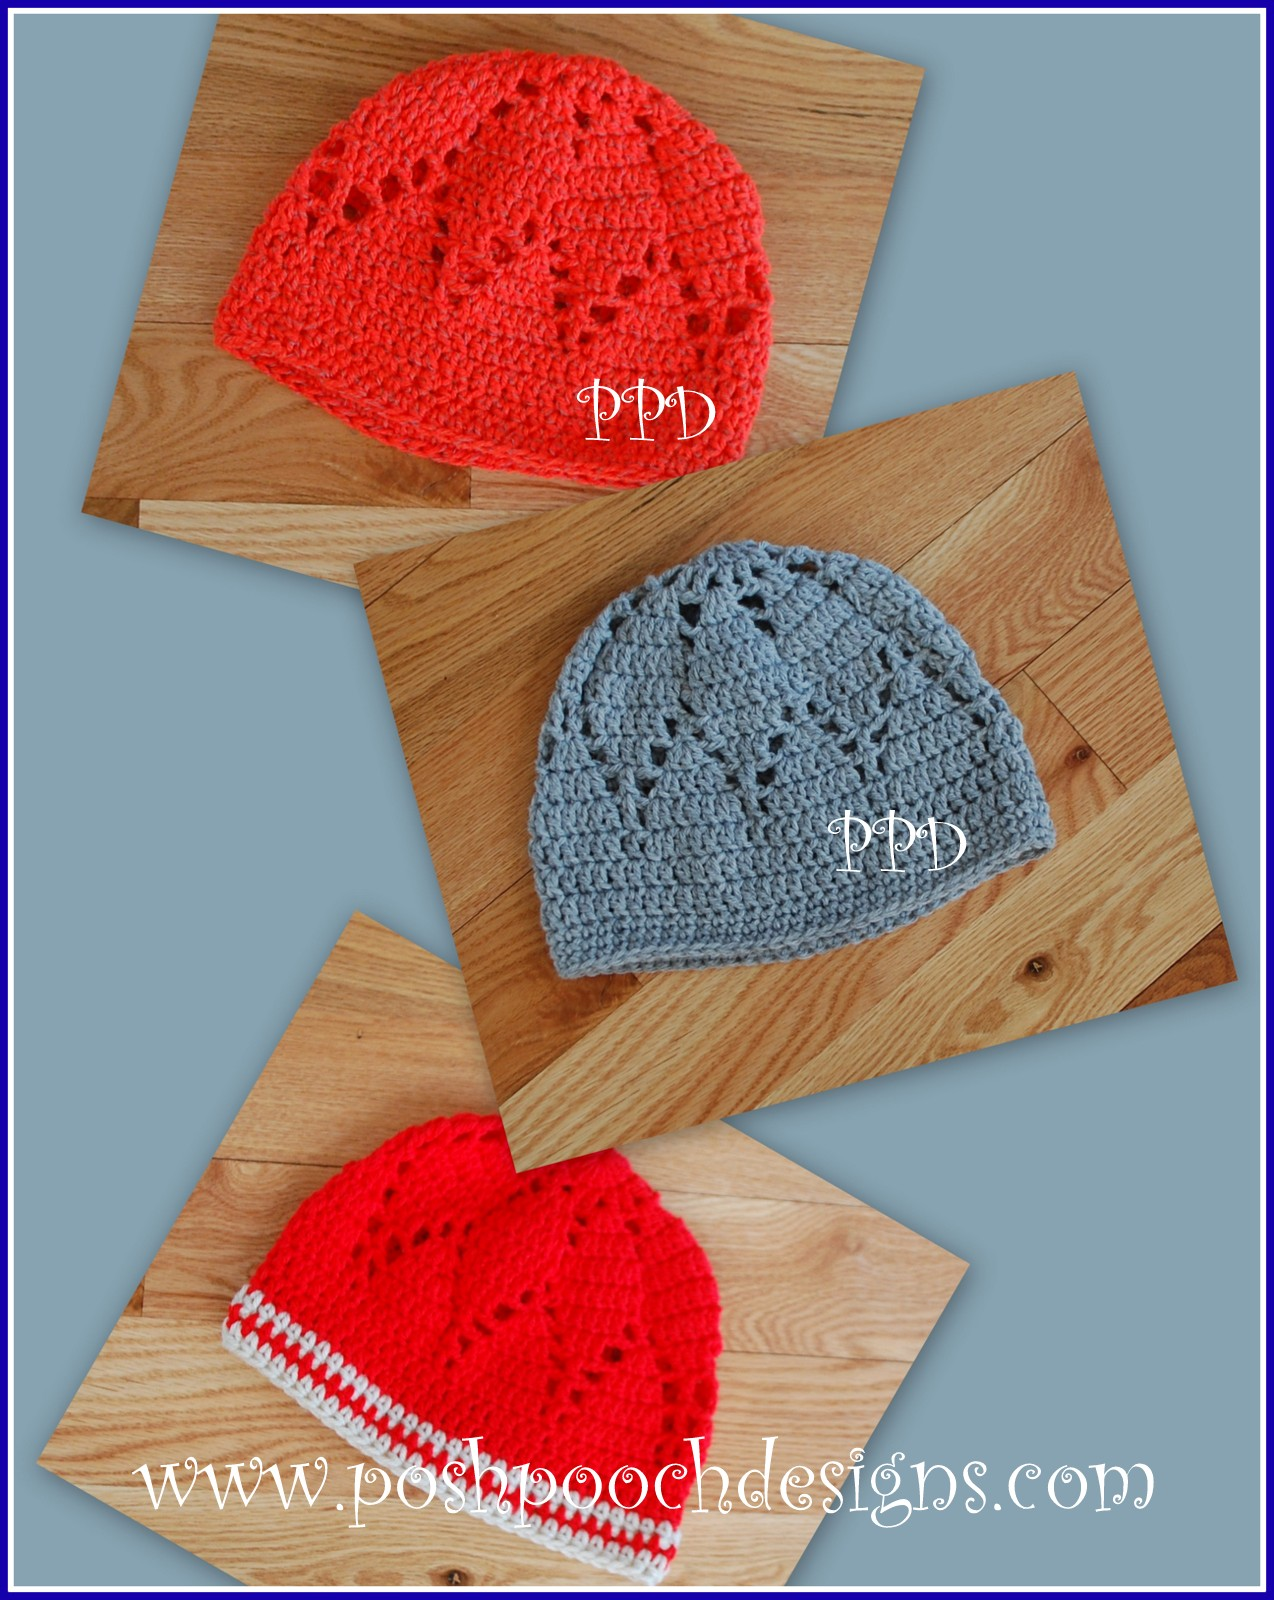 Free Crochet Pattern Dog Beanie : Posh Pooch Designs Dog Clothes: Pineapple Stitch Beanie ...